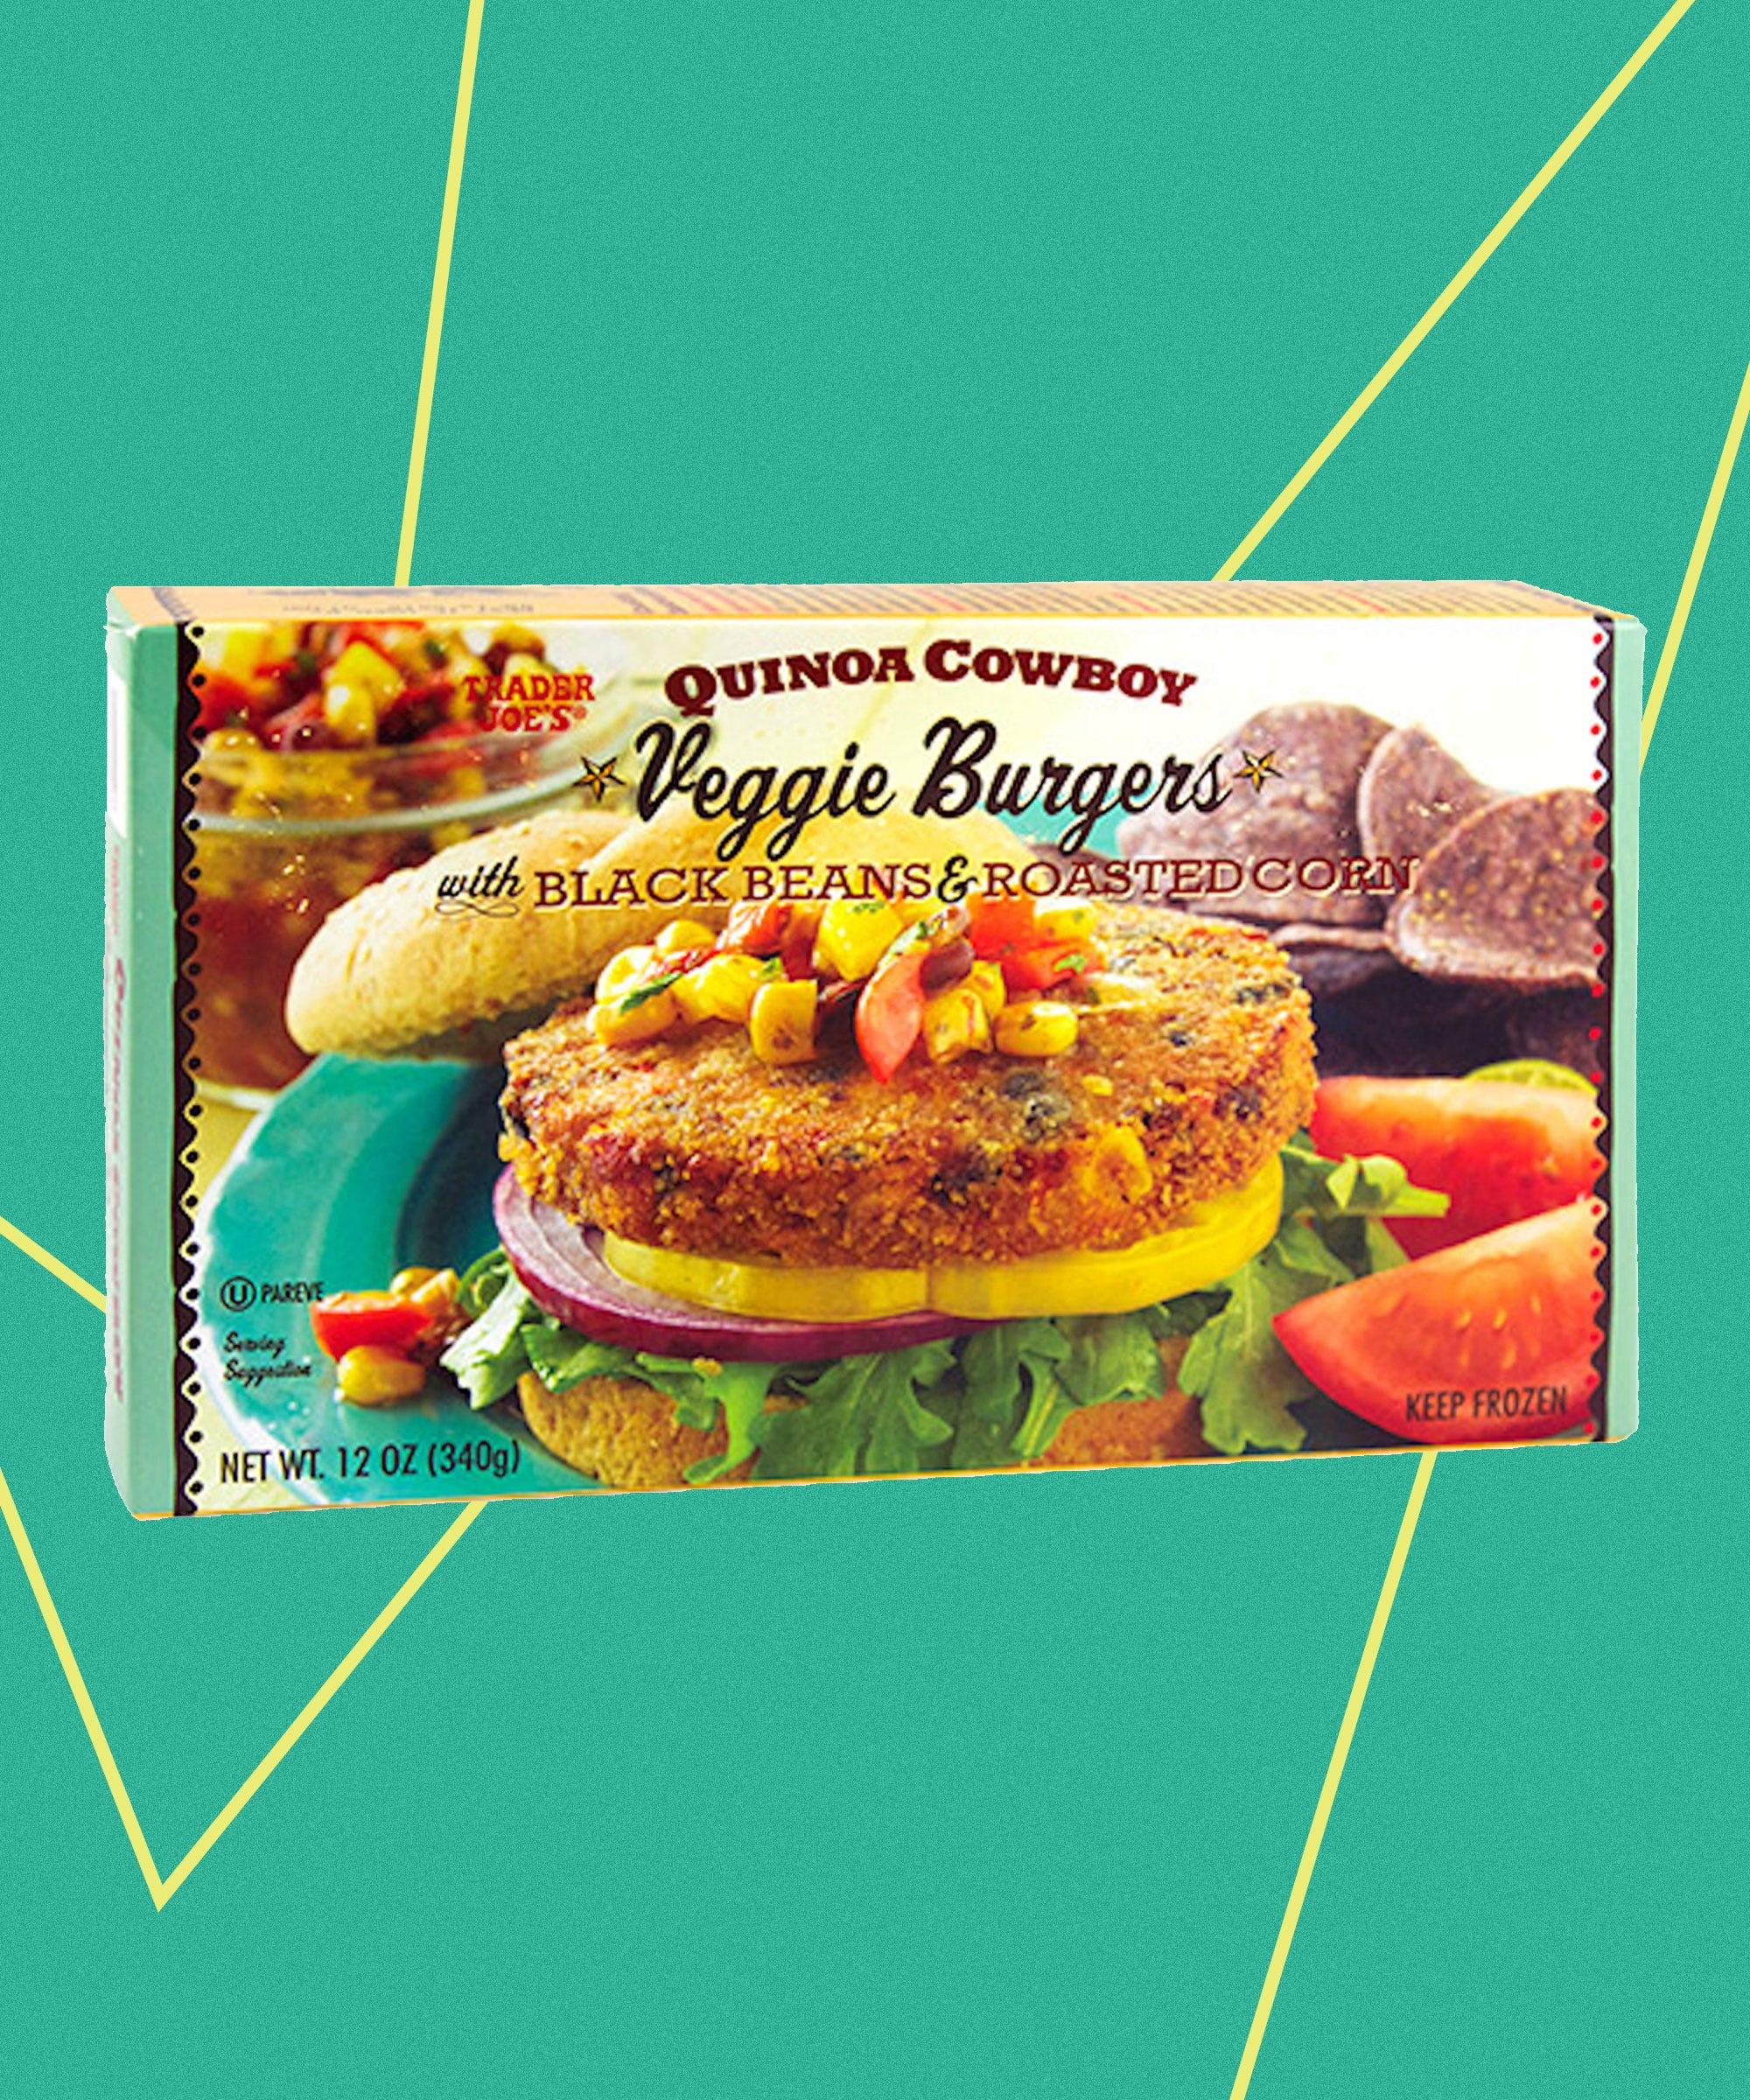 Vegetarians & Vegans Weigh In On The Best Meatless Burger Options